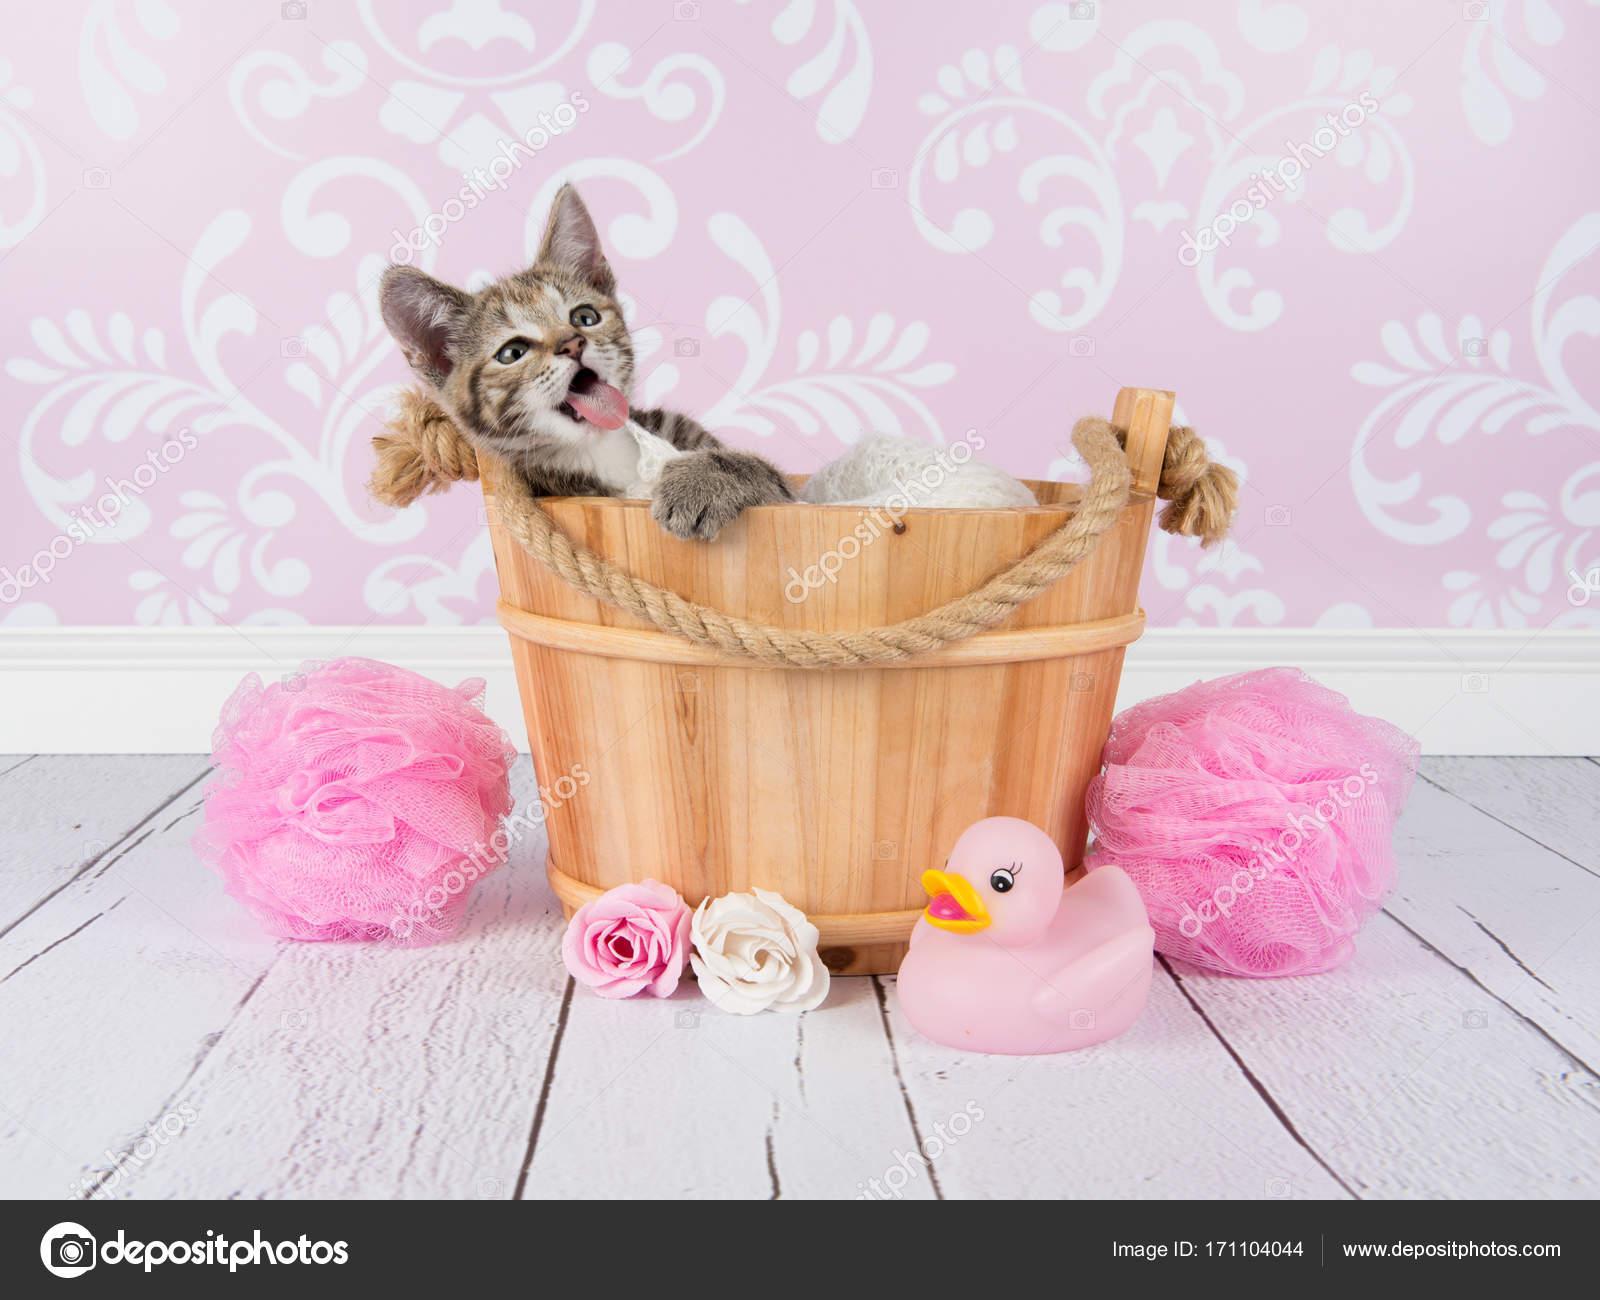 34e96075cb Χαριτωμένο νεαρό γάτα Τάμπι γατάκι σε ένα ξύλινο μπάνιο σε μια ρύθμιση ροζ  μπάνιο — Φωτογραφία